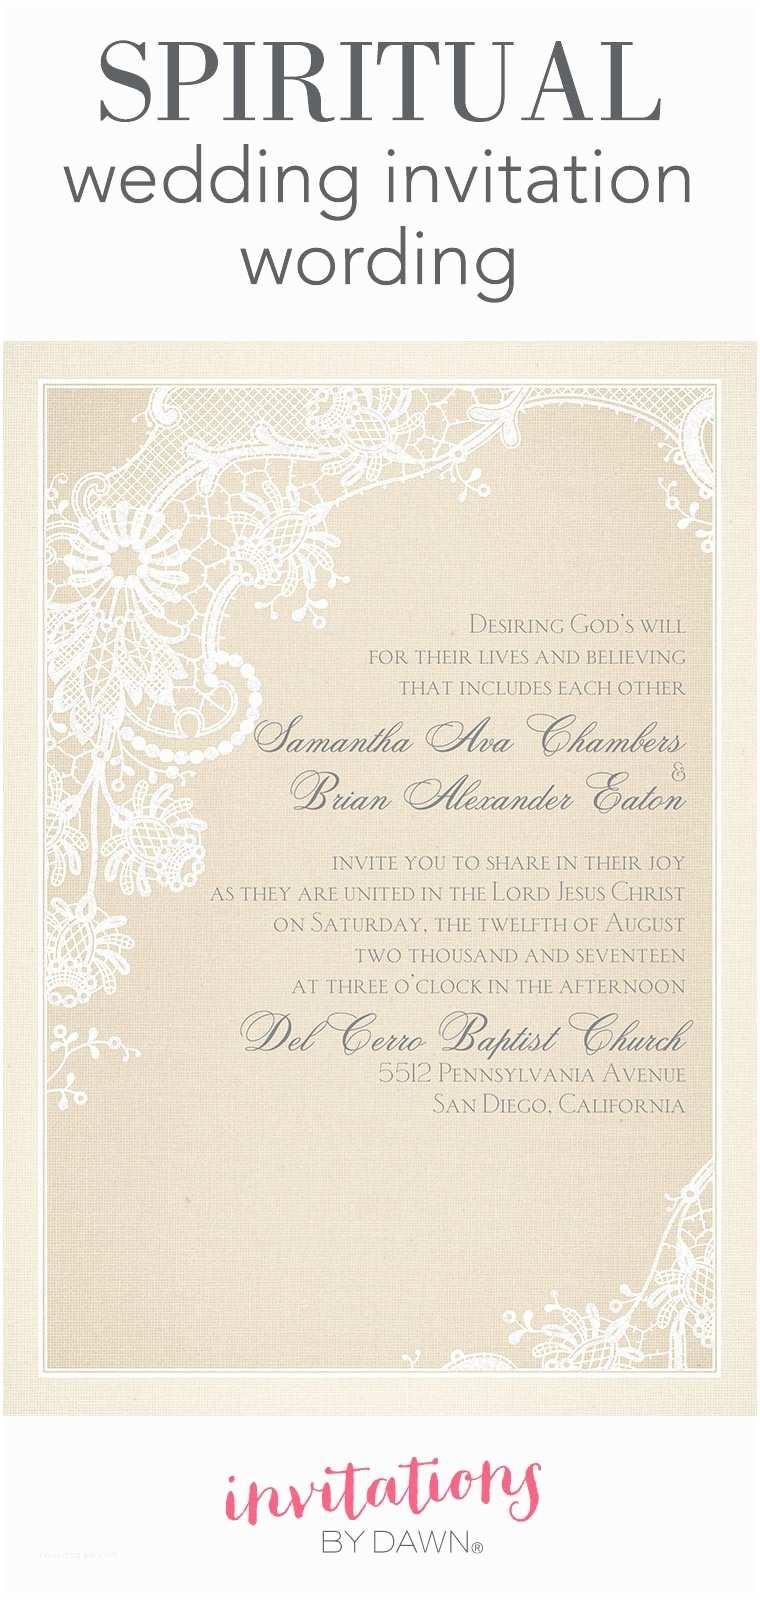 Christian Wedding Invitation Wording Christian Wedding Invitation Wording